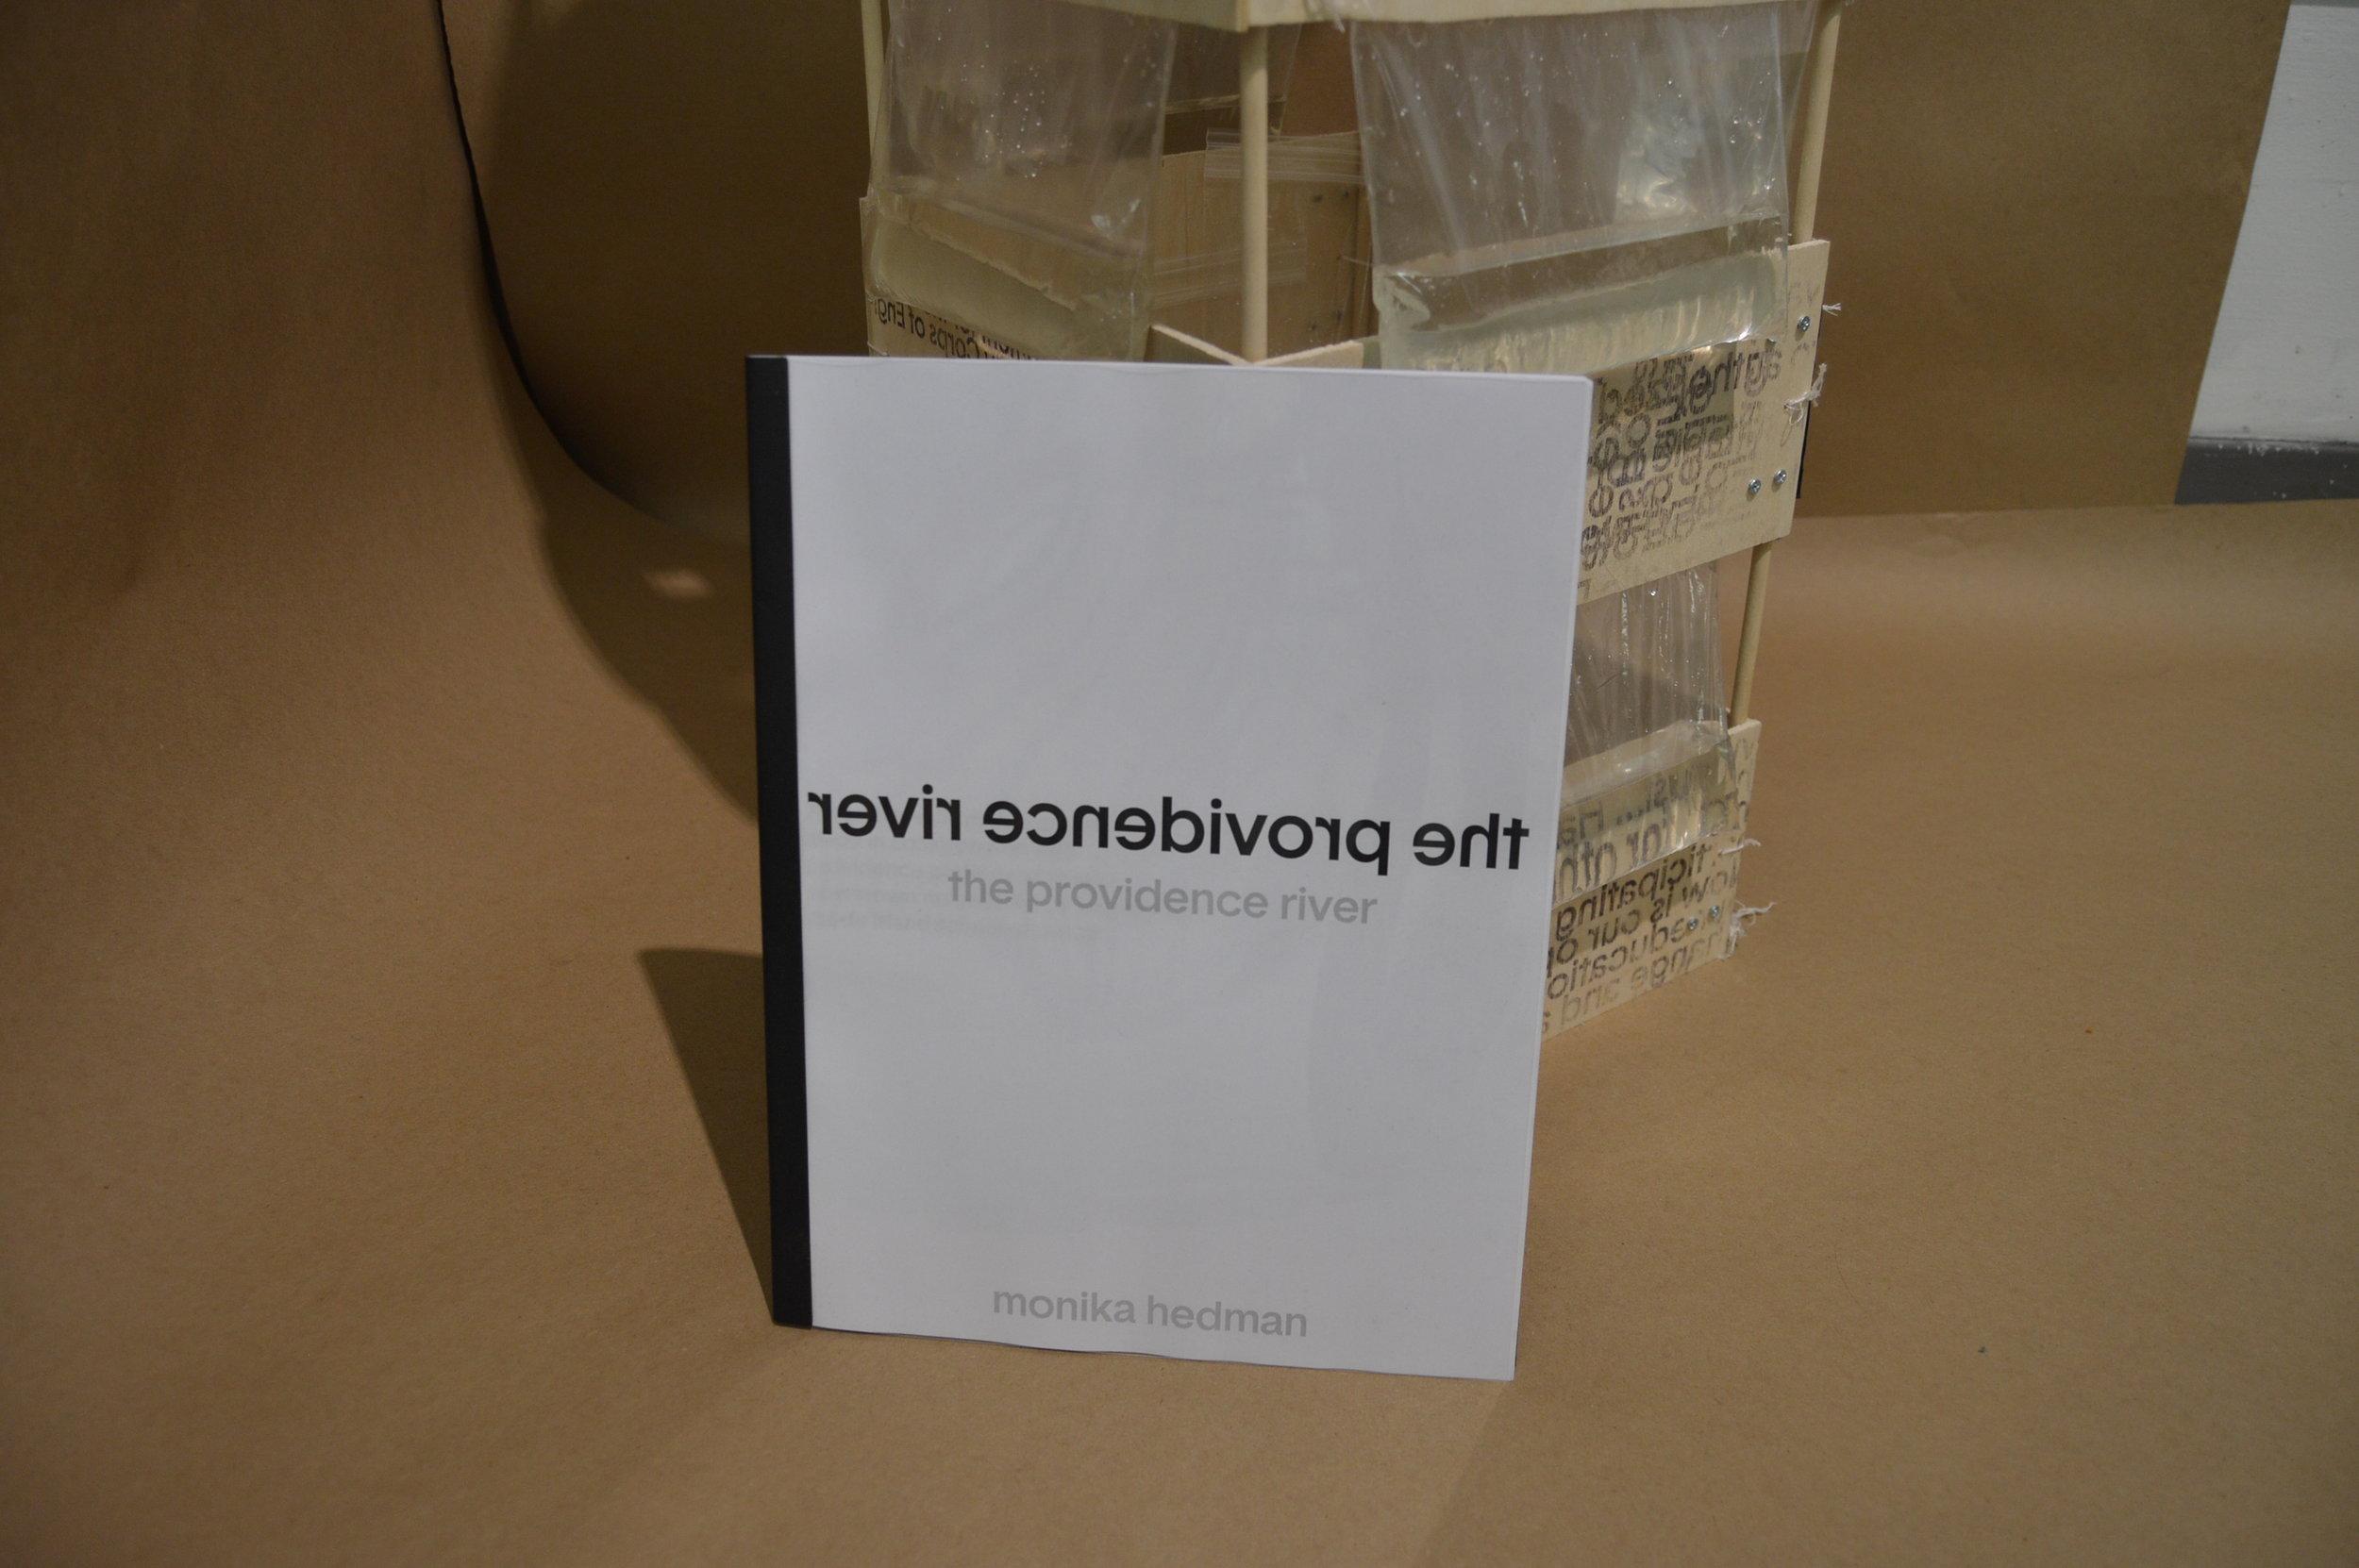 provriv_book_2.JPG